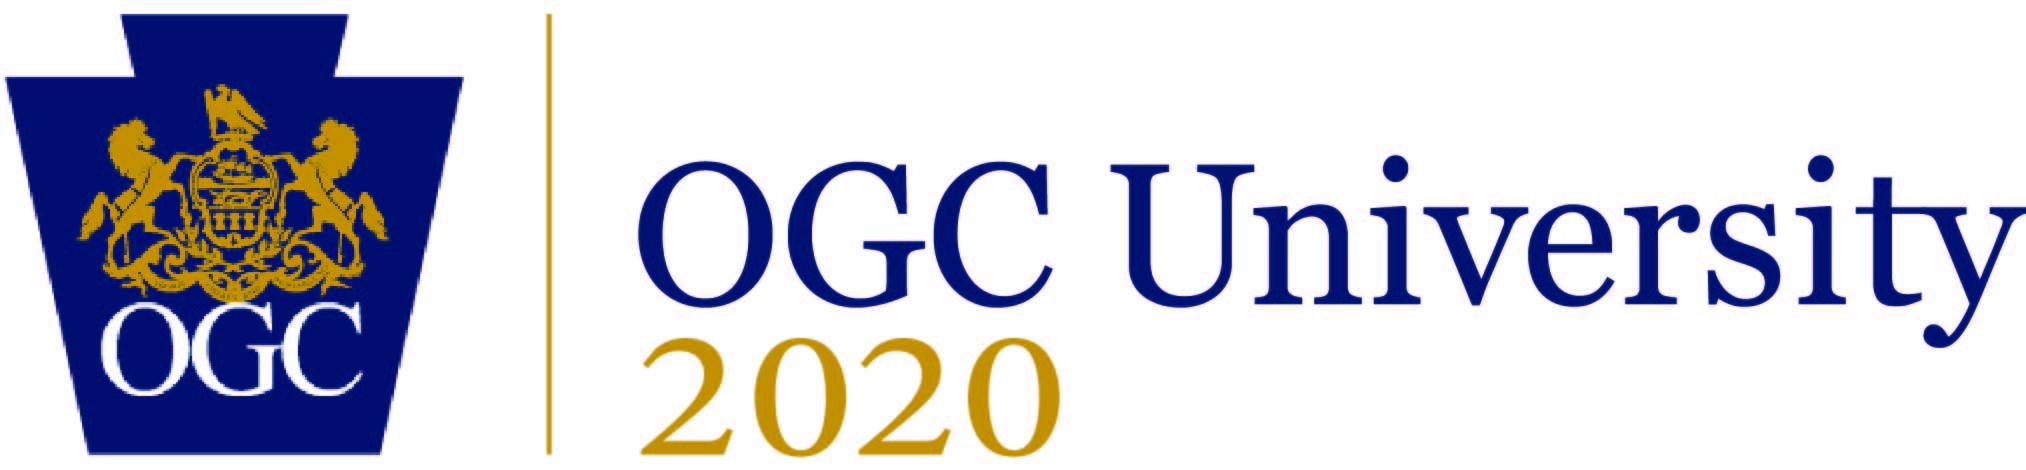 OGC University